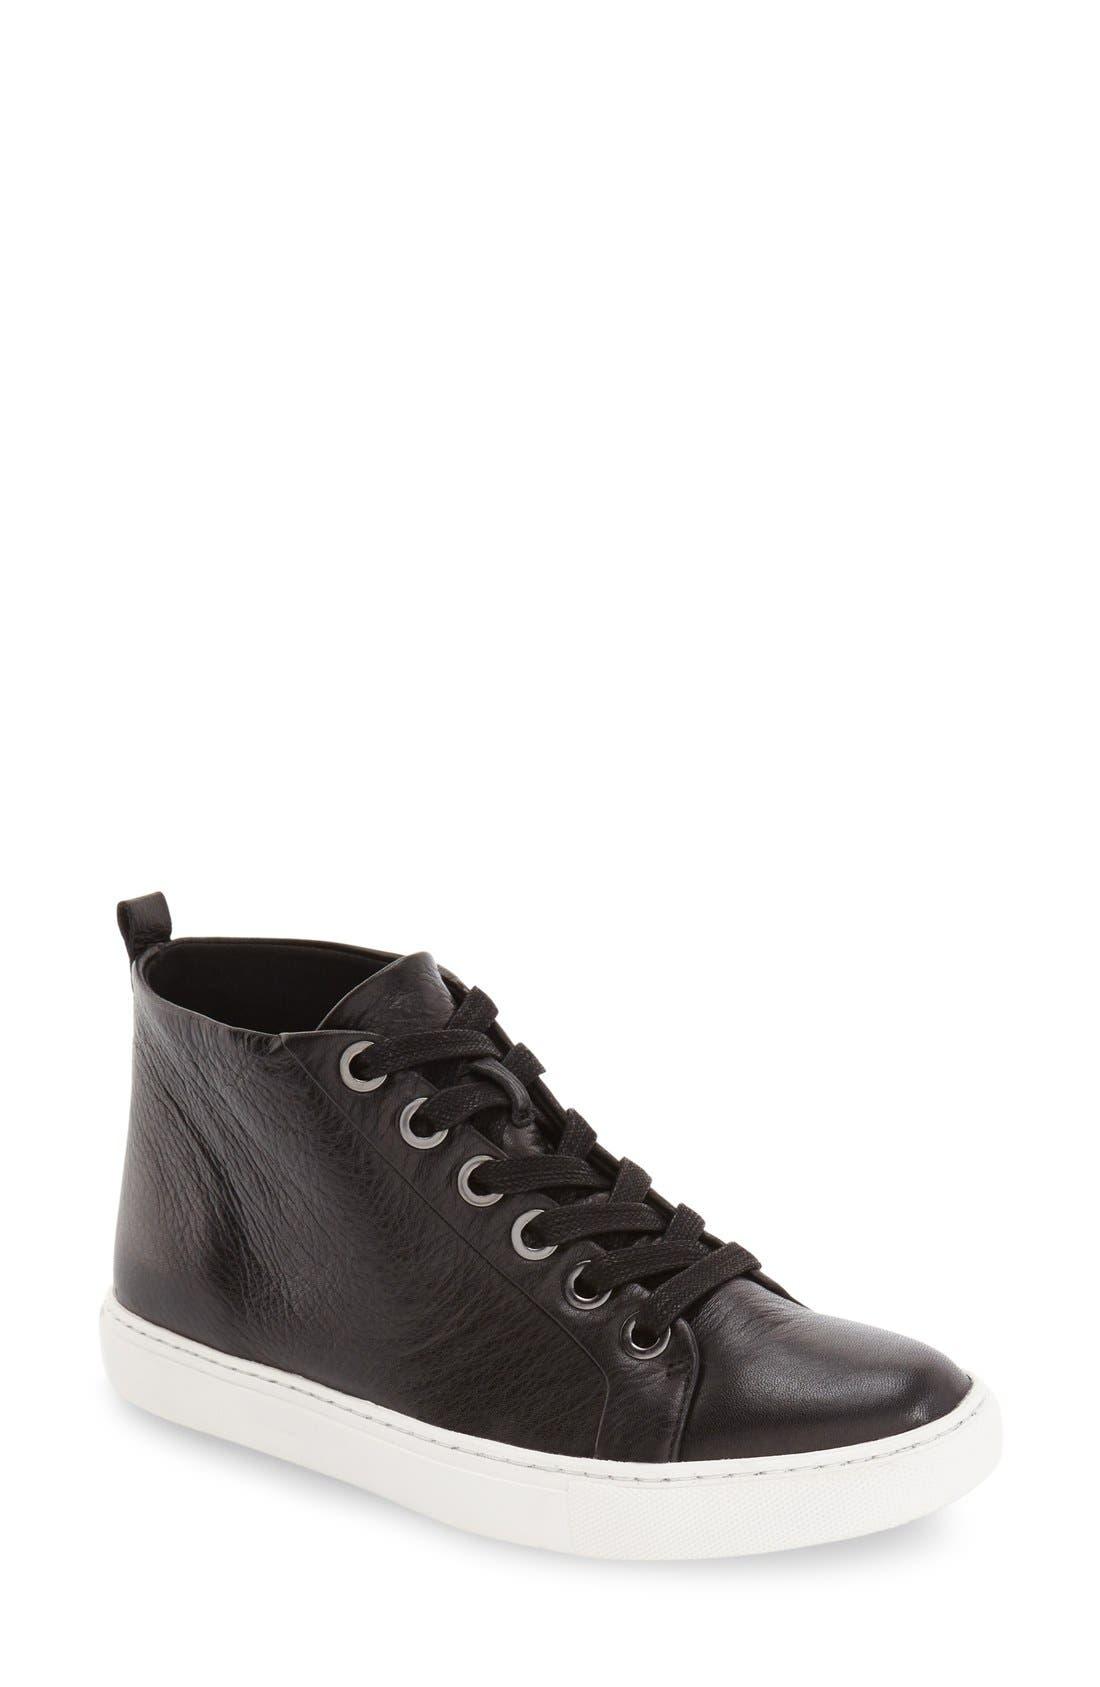 Main Image - Kenneth Cole New York 'Kaleb' High Top Sneaker (Women)